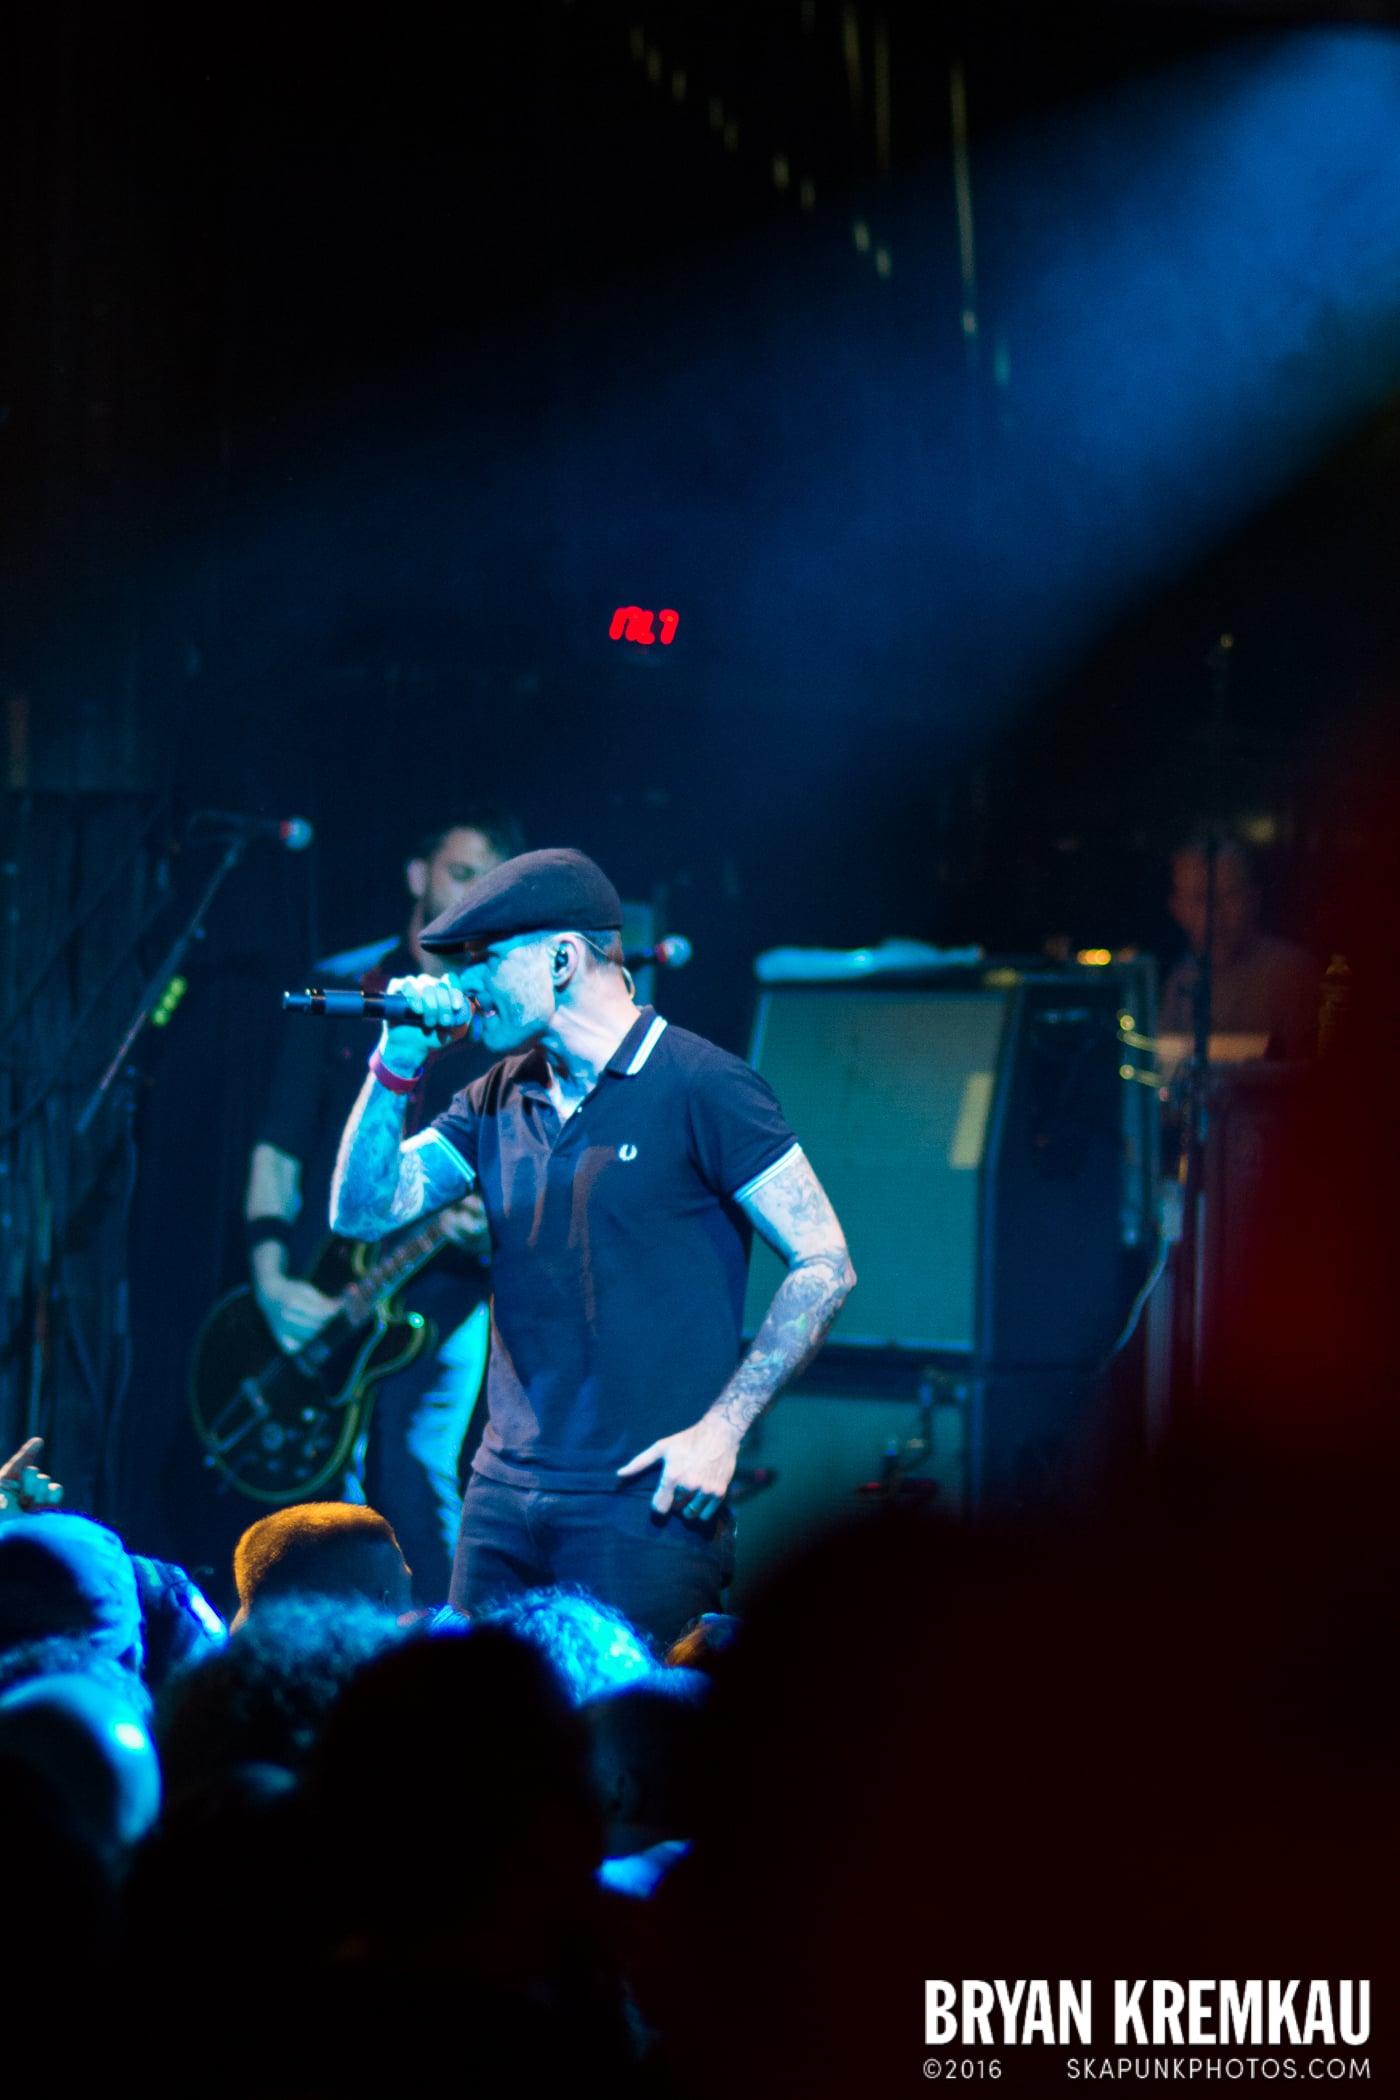 The Dropkick Murphys @ Irving Plaza, NYC - 3.9.15 (10)